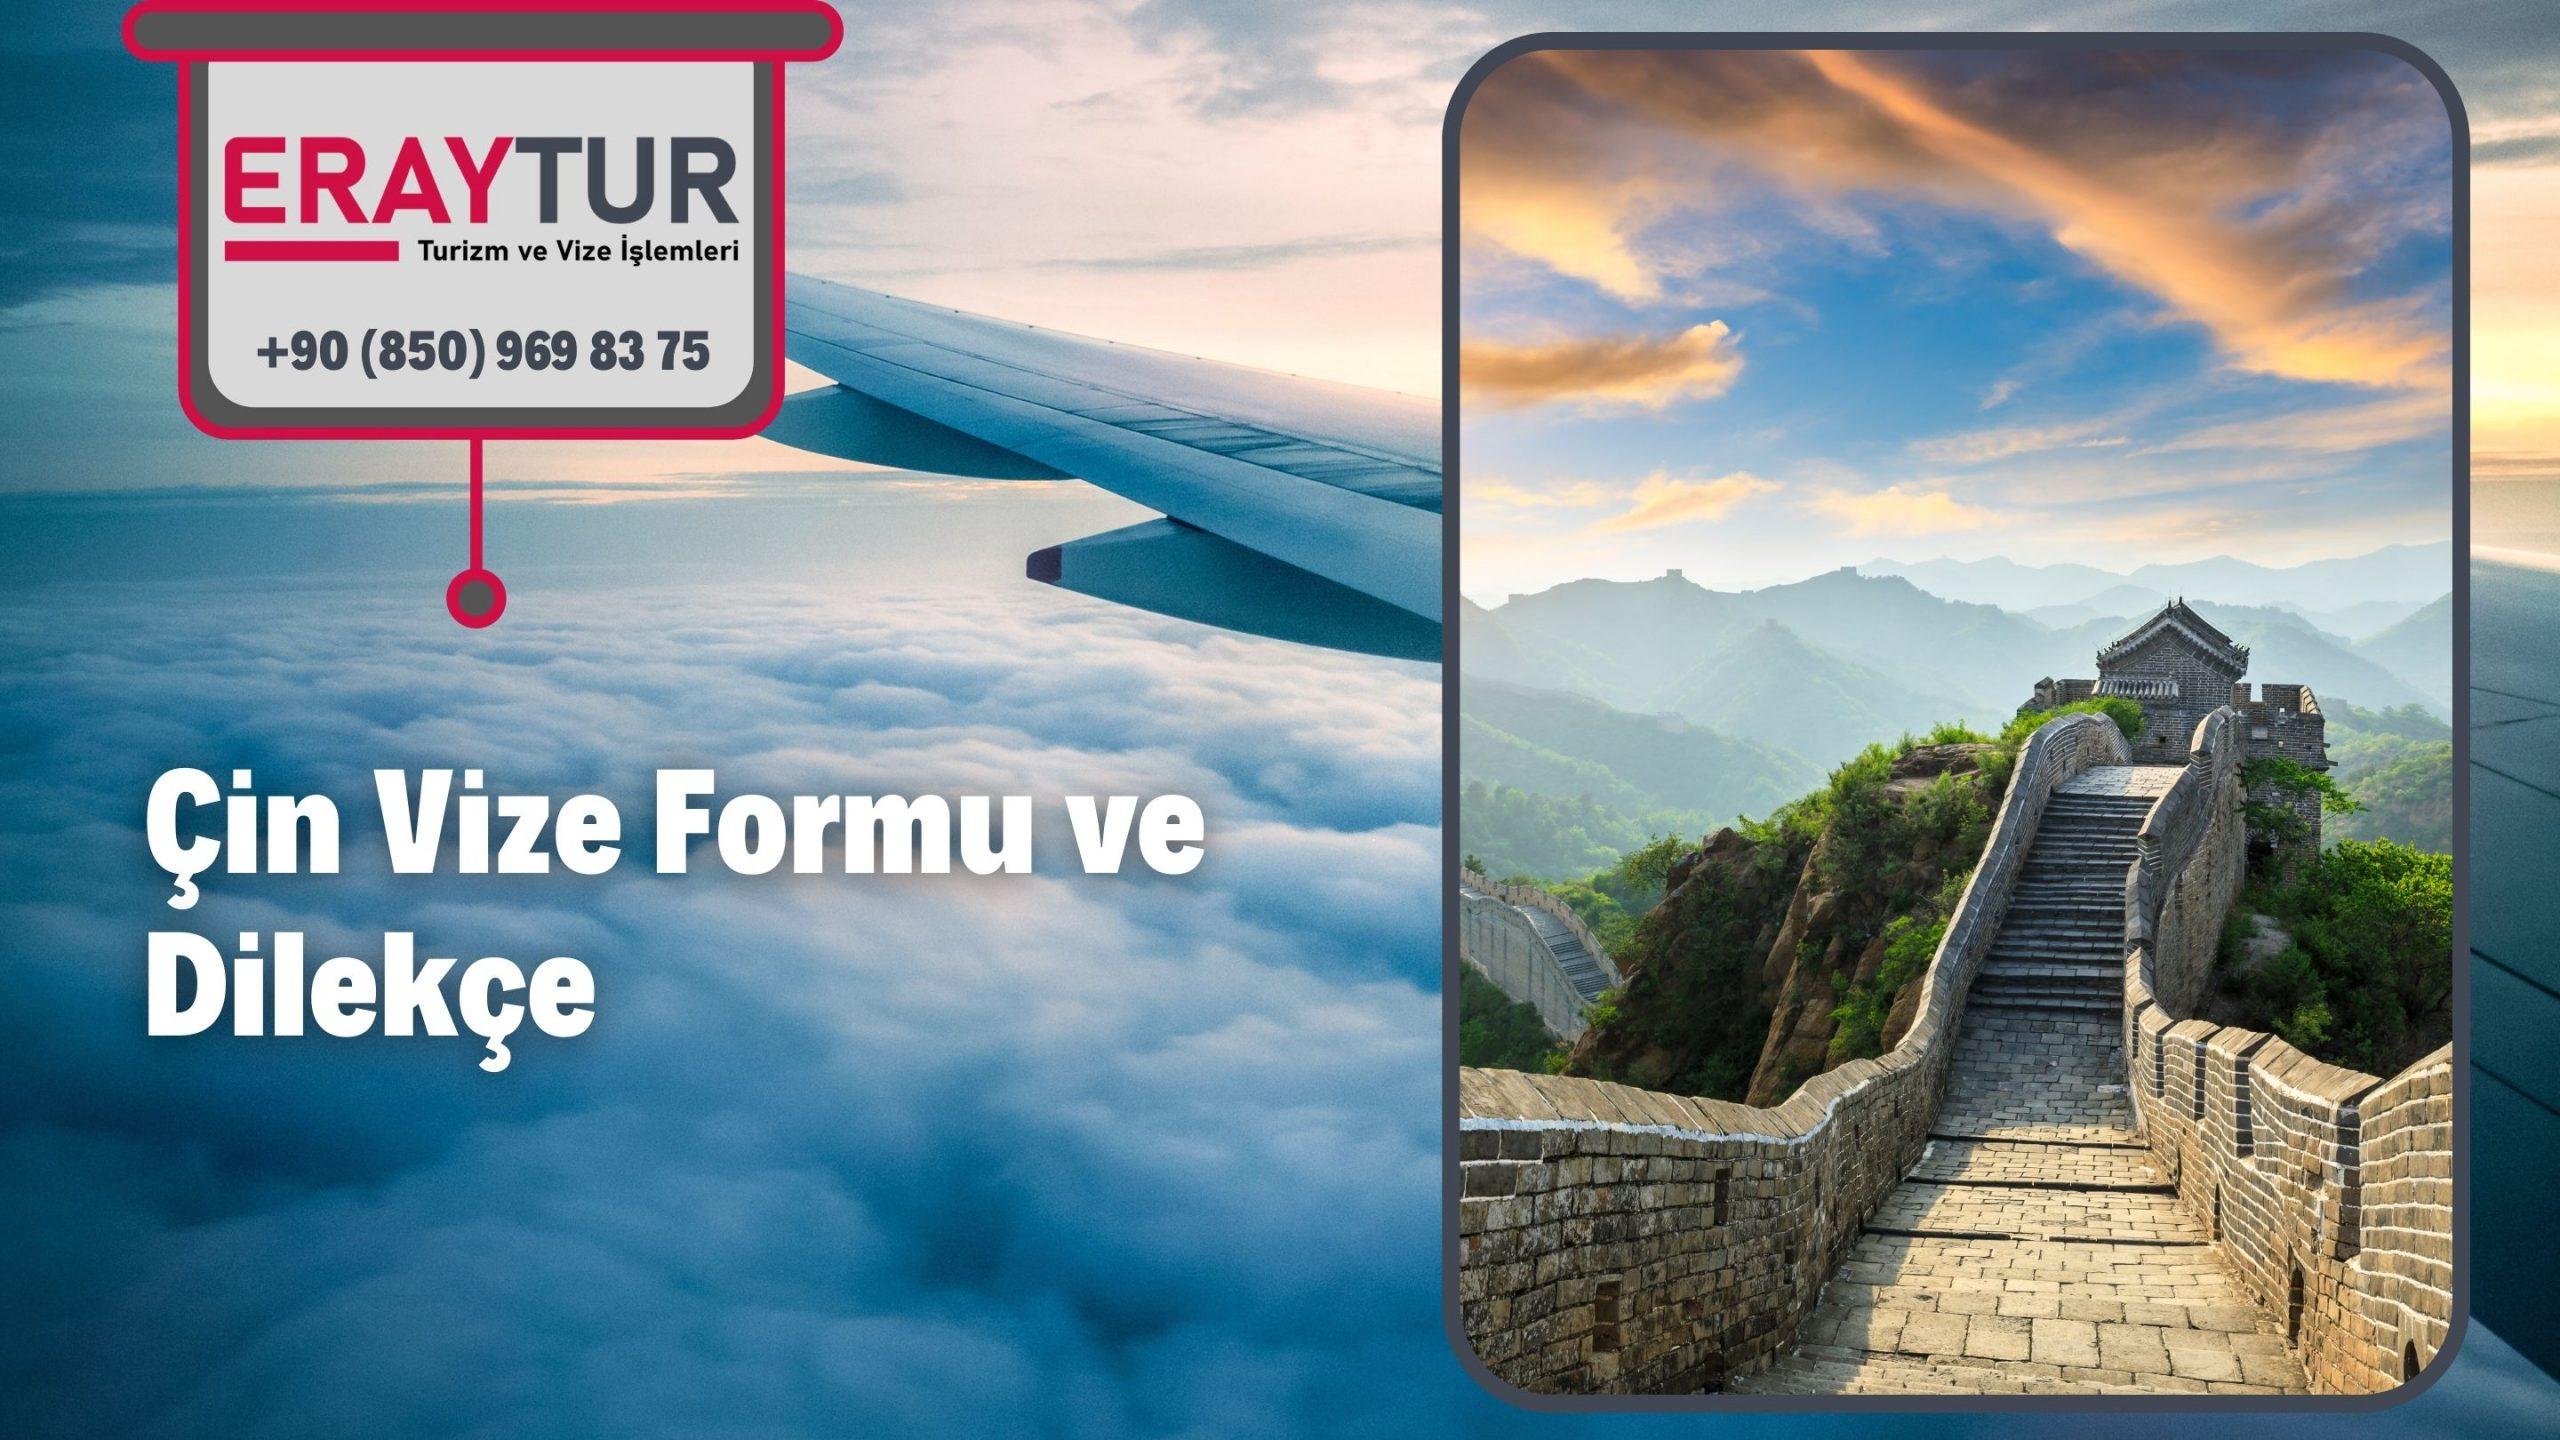 Çin Vize Formu ve Dilekçe 1 – in vize formu ve dilekce 1 scaled